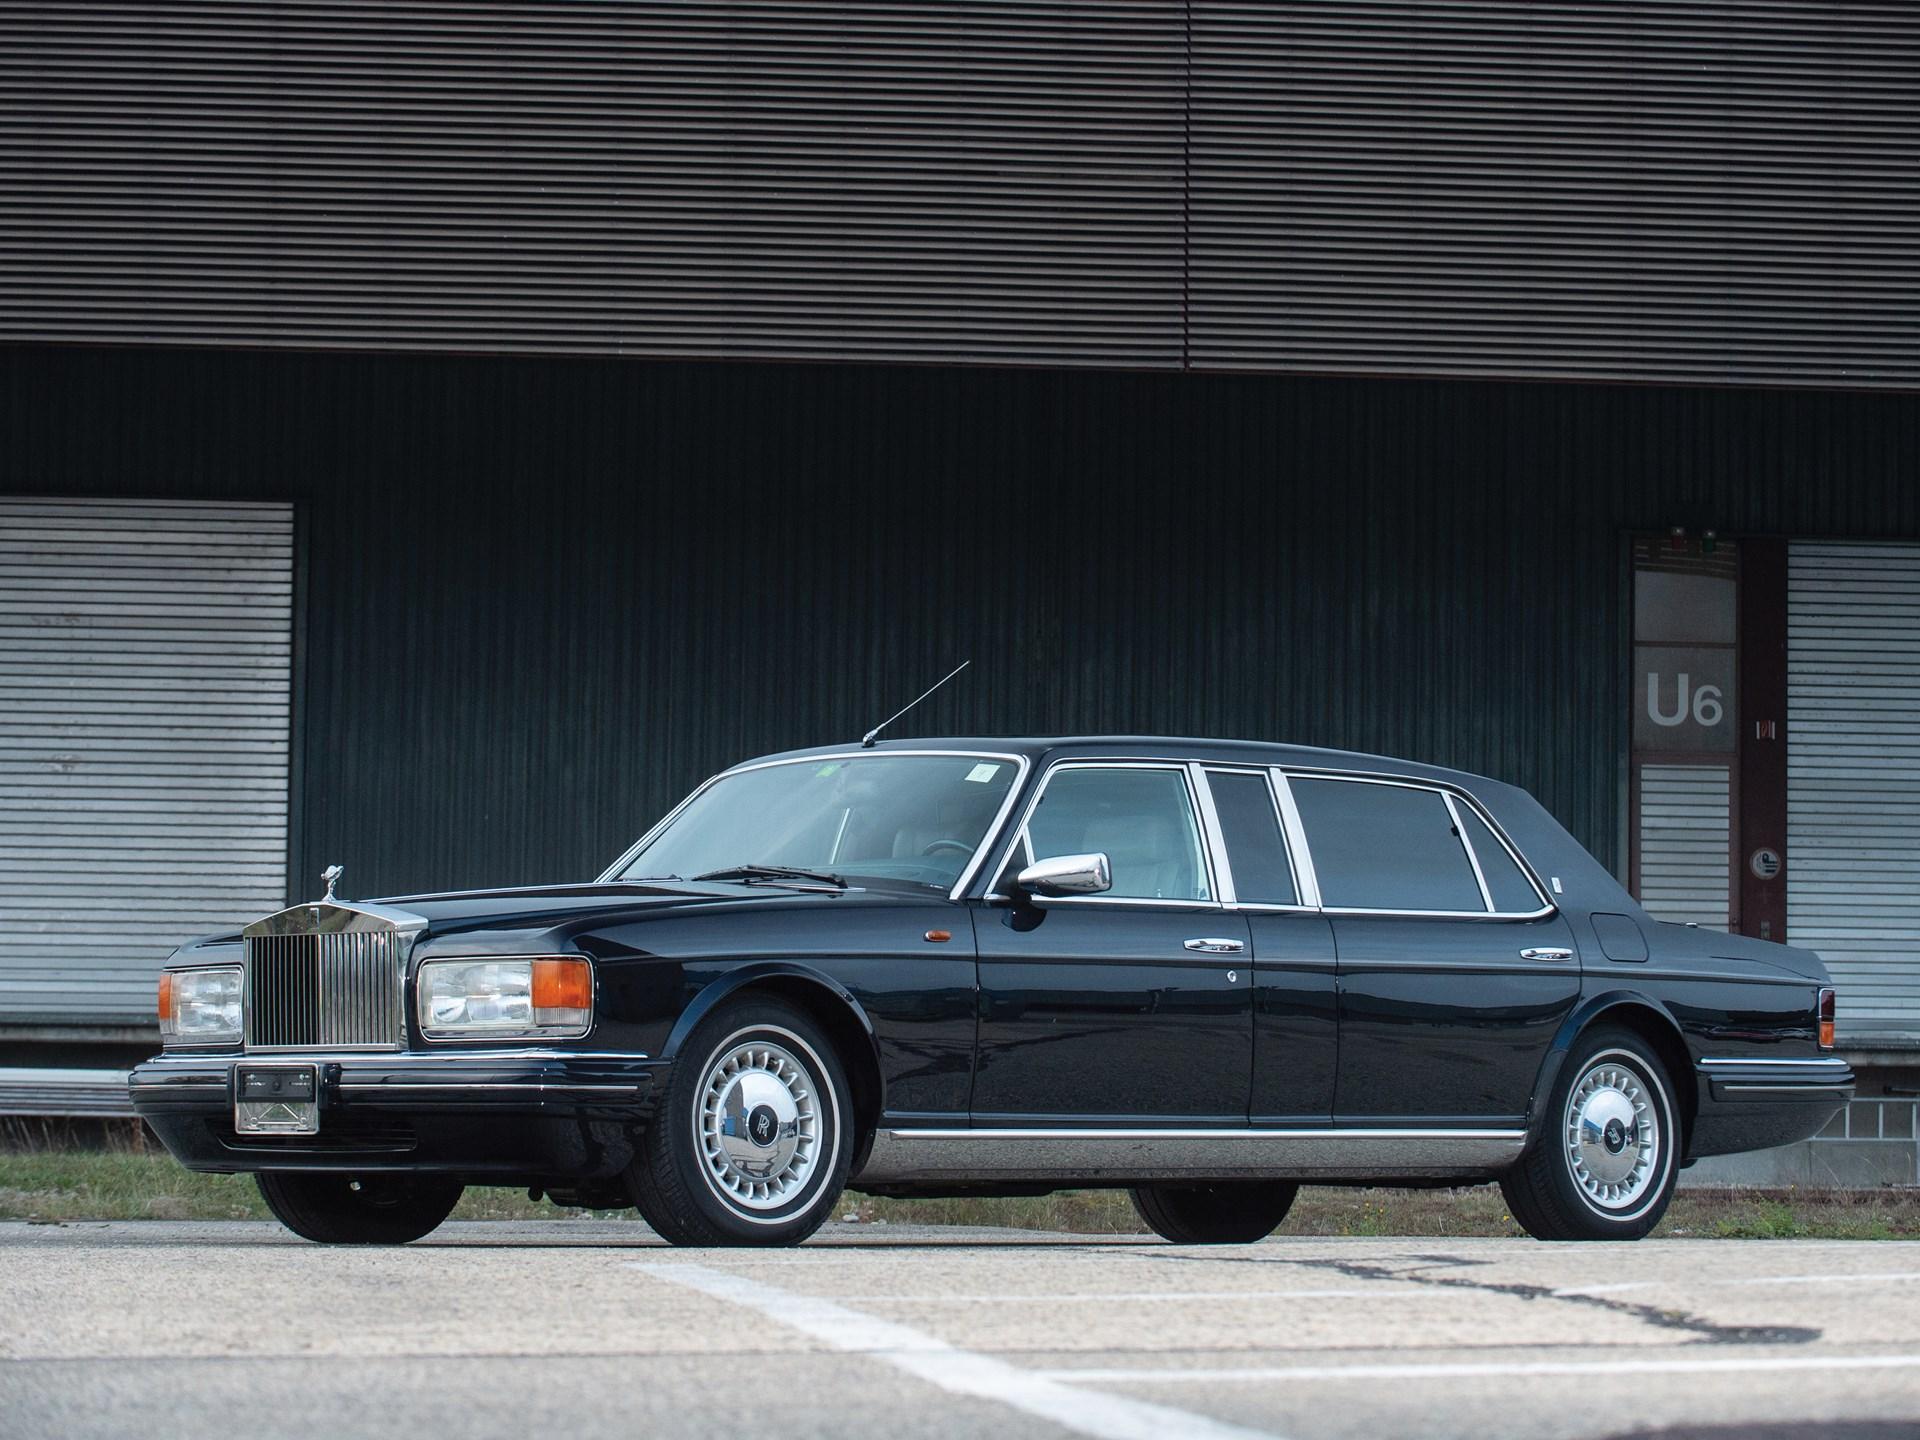 Rolls Royce Limo >> Rm Sotheby S 1998 Rolls Royce Silver Spur Limousine Essen 2019